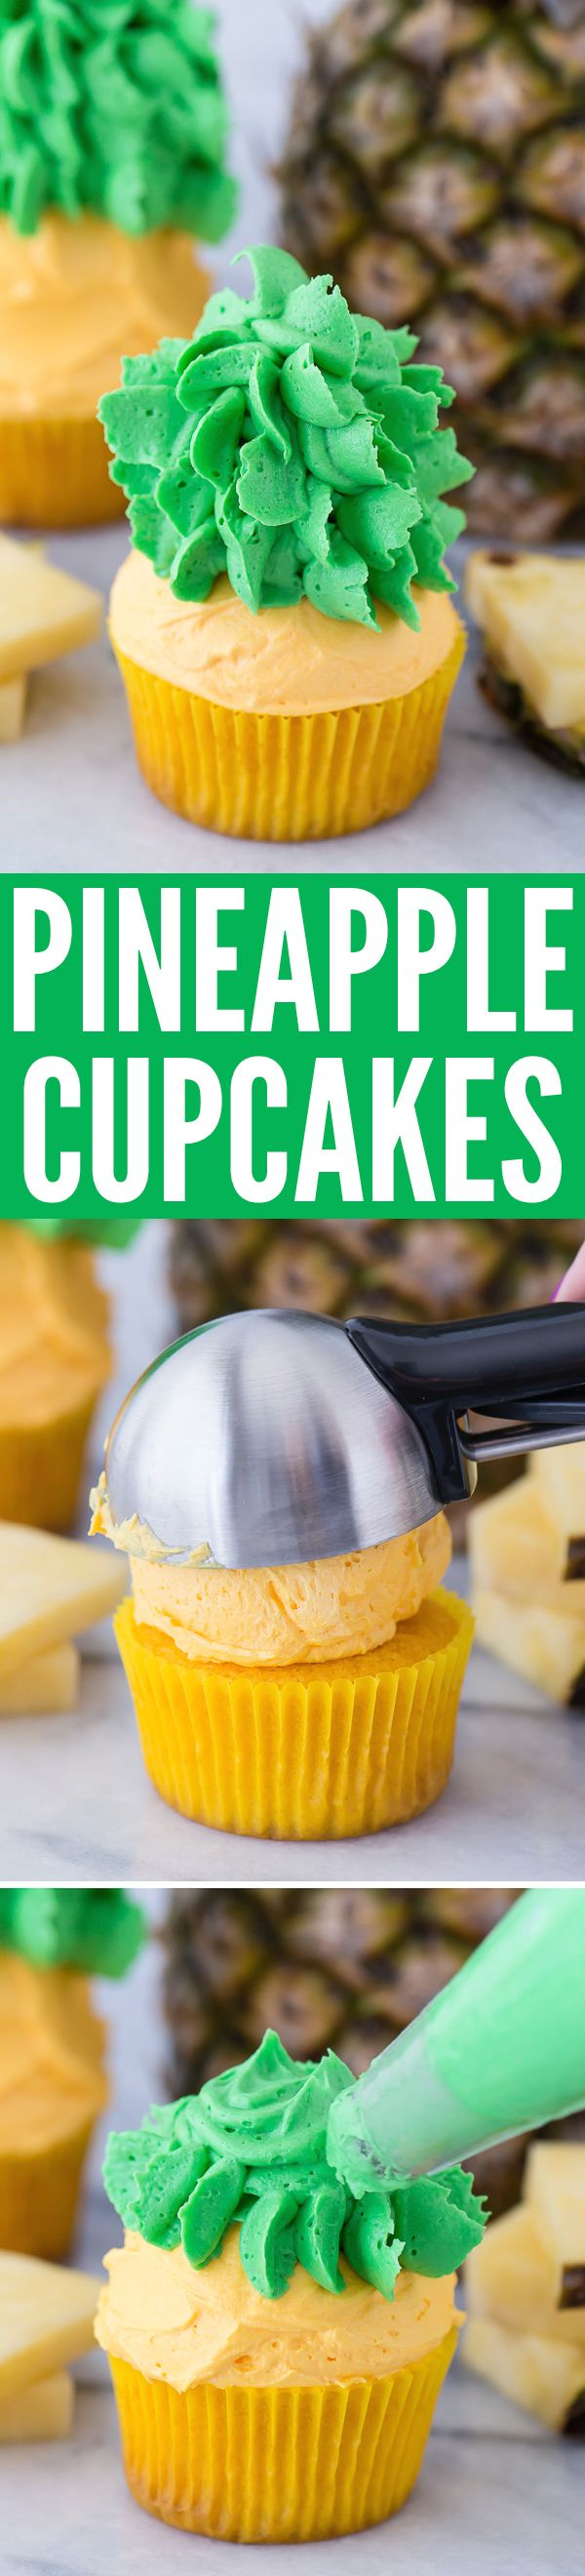 Pineapple cupcakes - cupcakes that look like PINEAPPLES! The buttercream tastes like pineapple too!